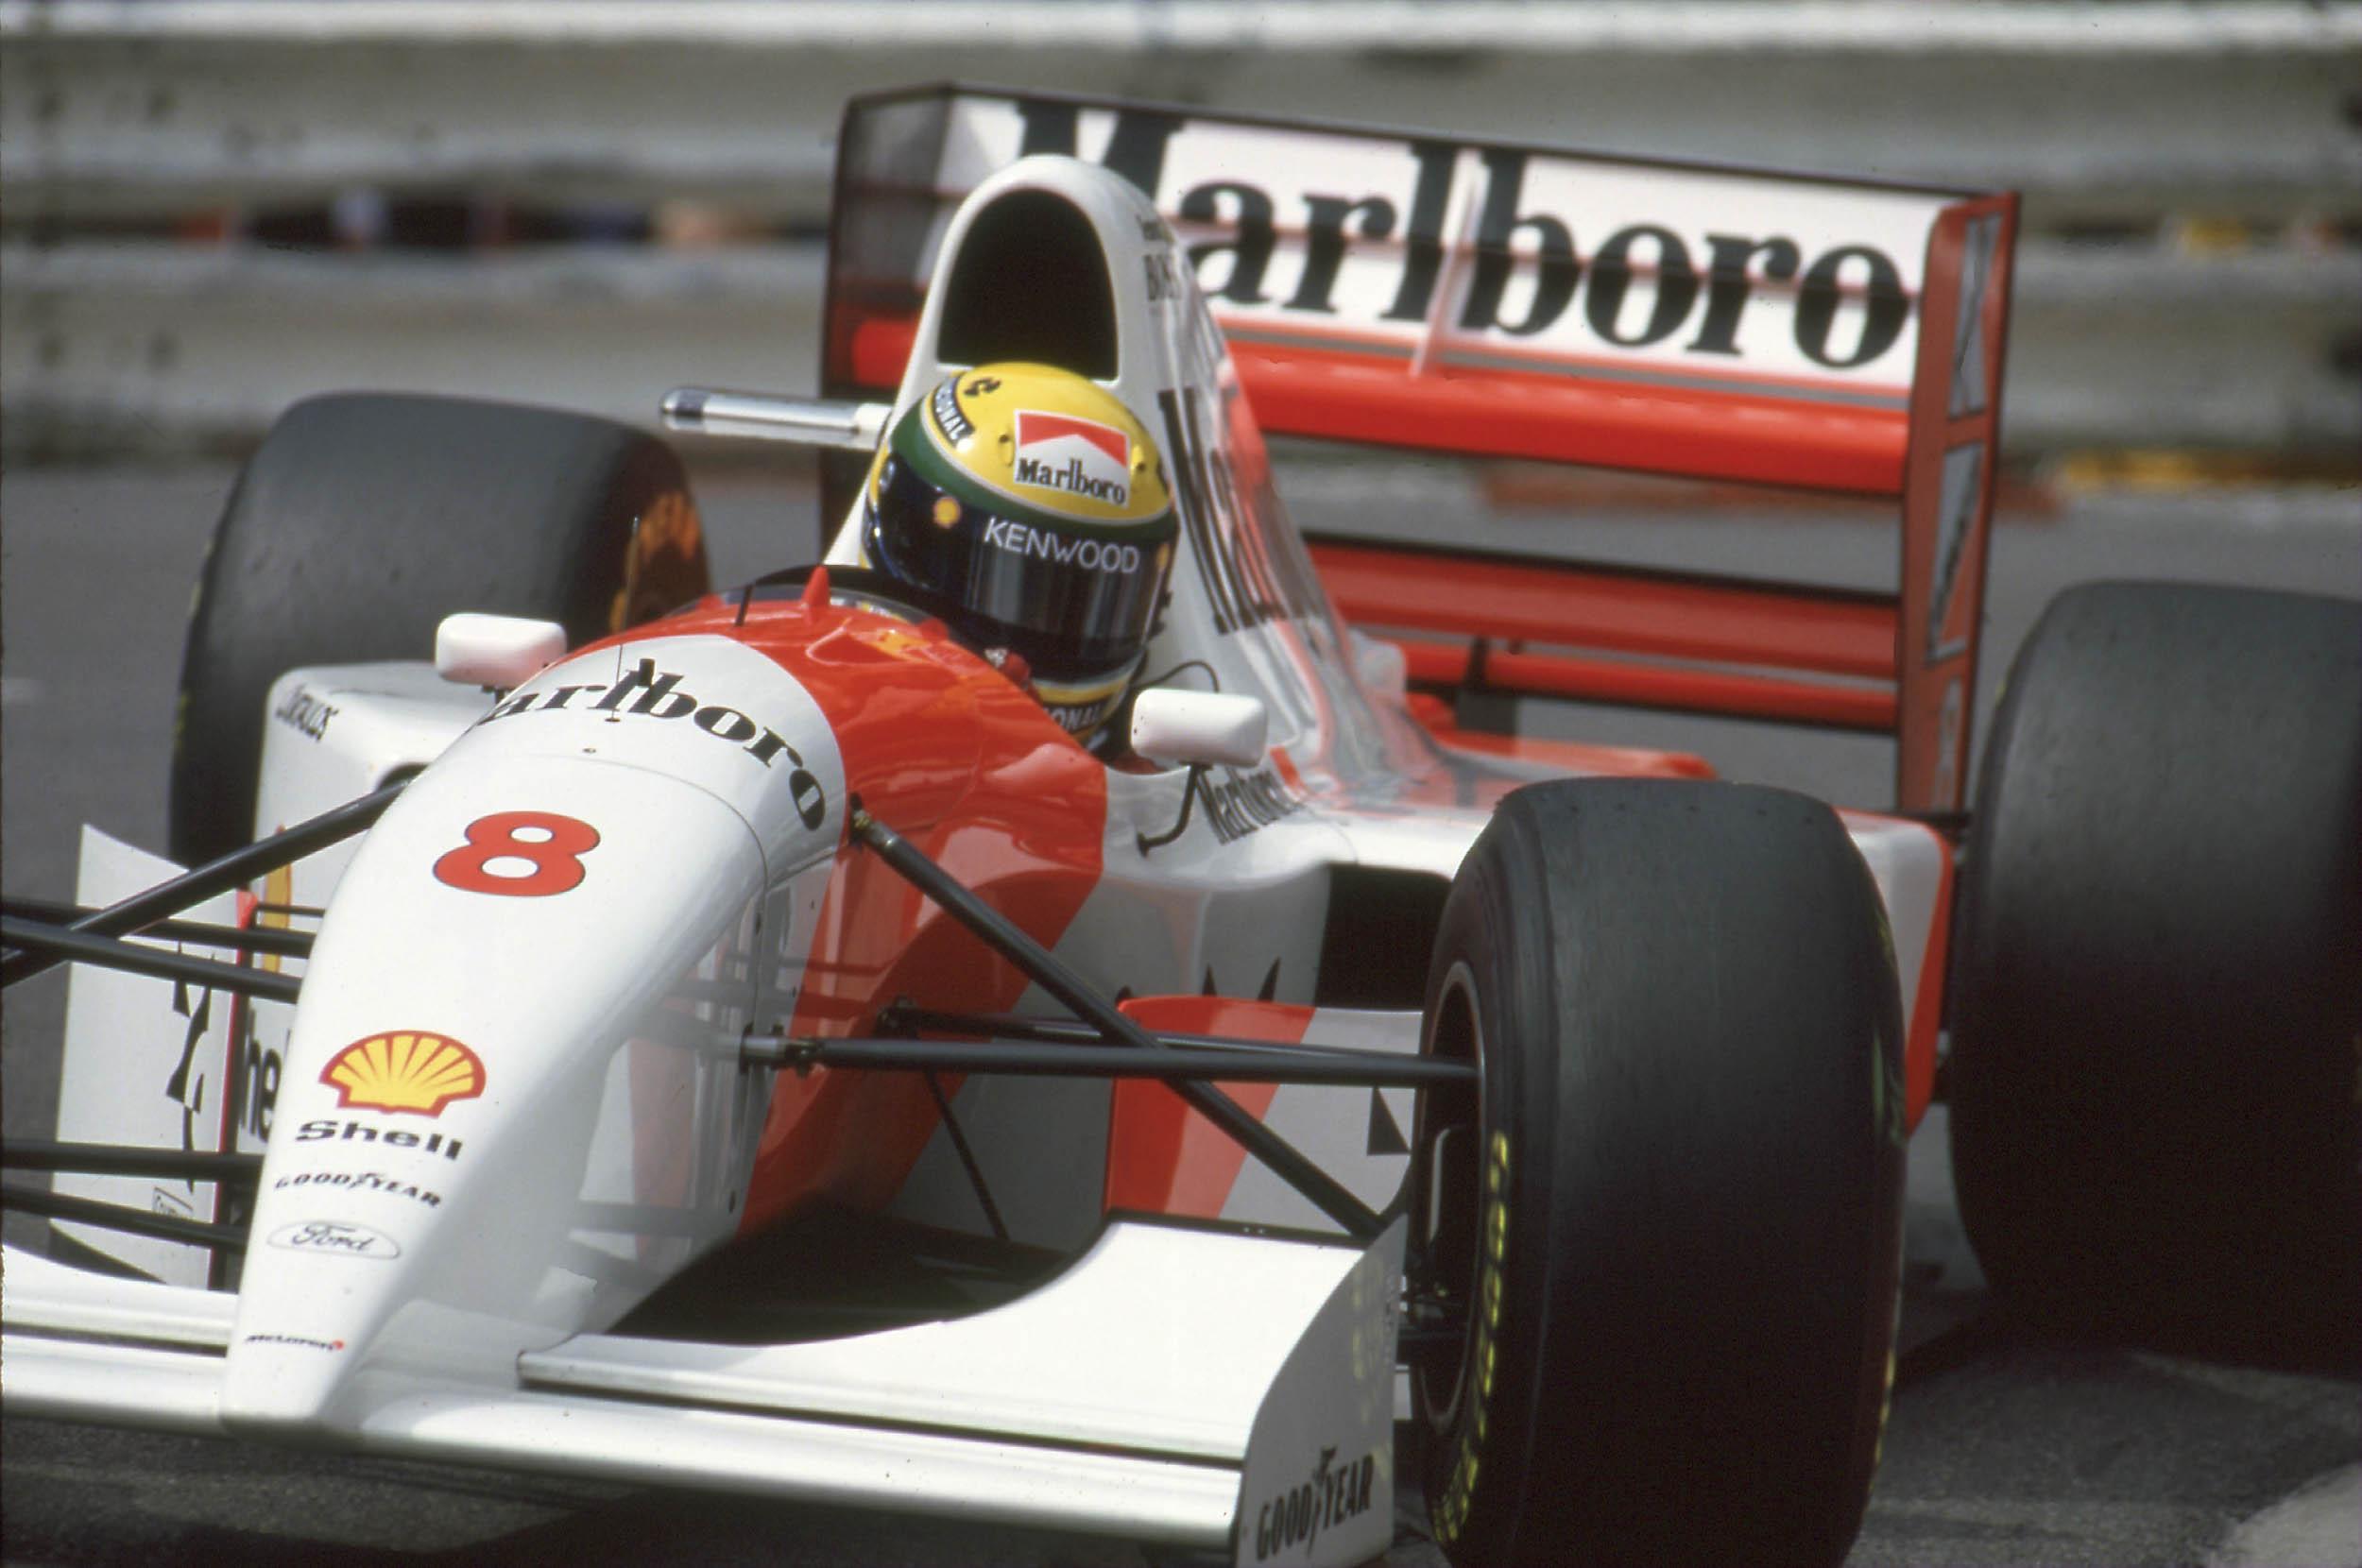 Senna McLaren-Ford F1 car head on